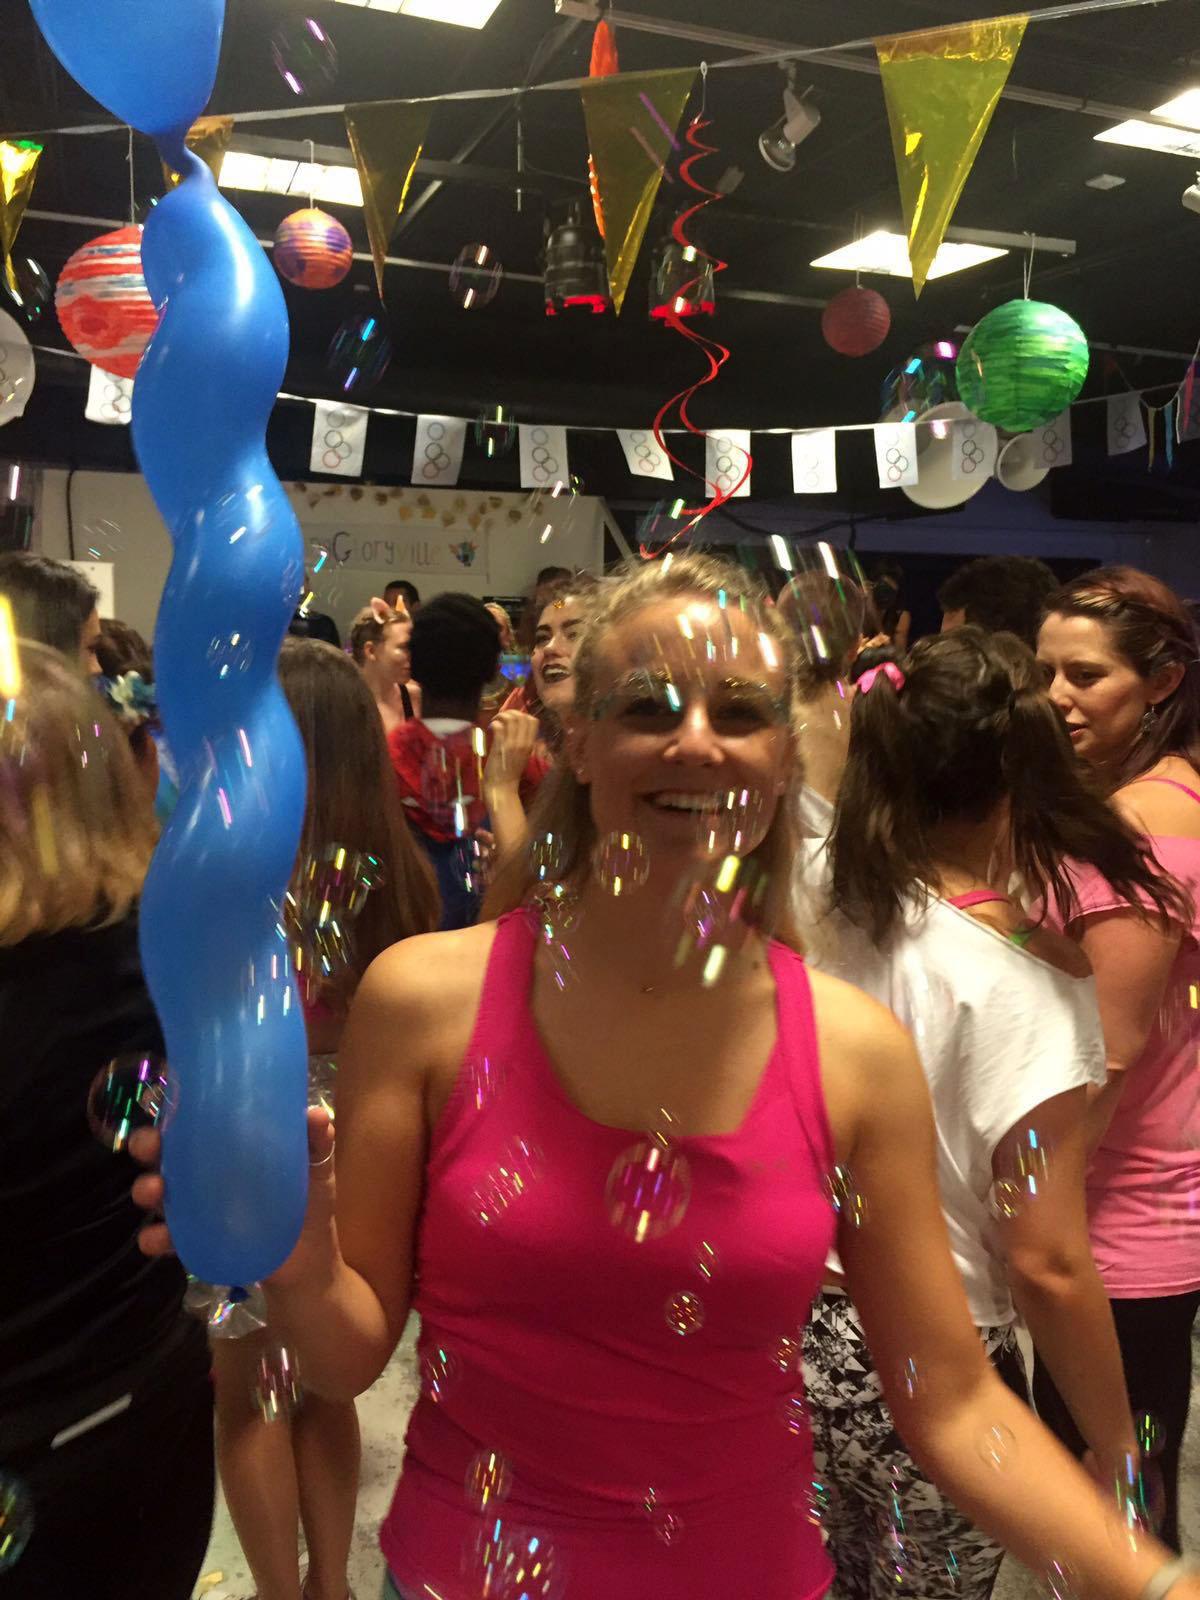 Dancing in bubbles